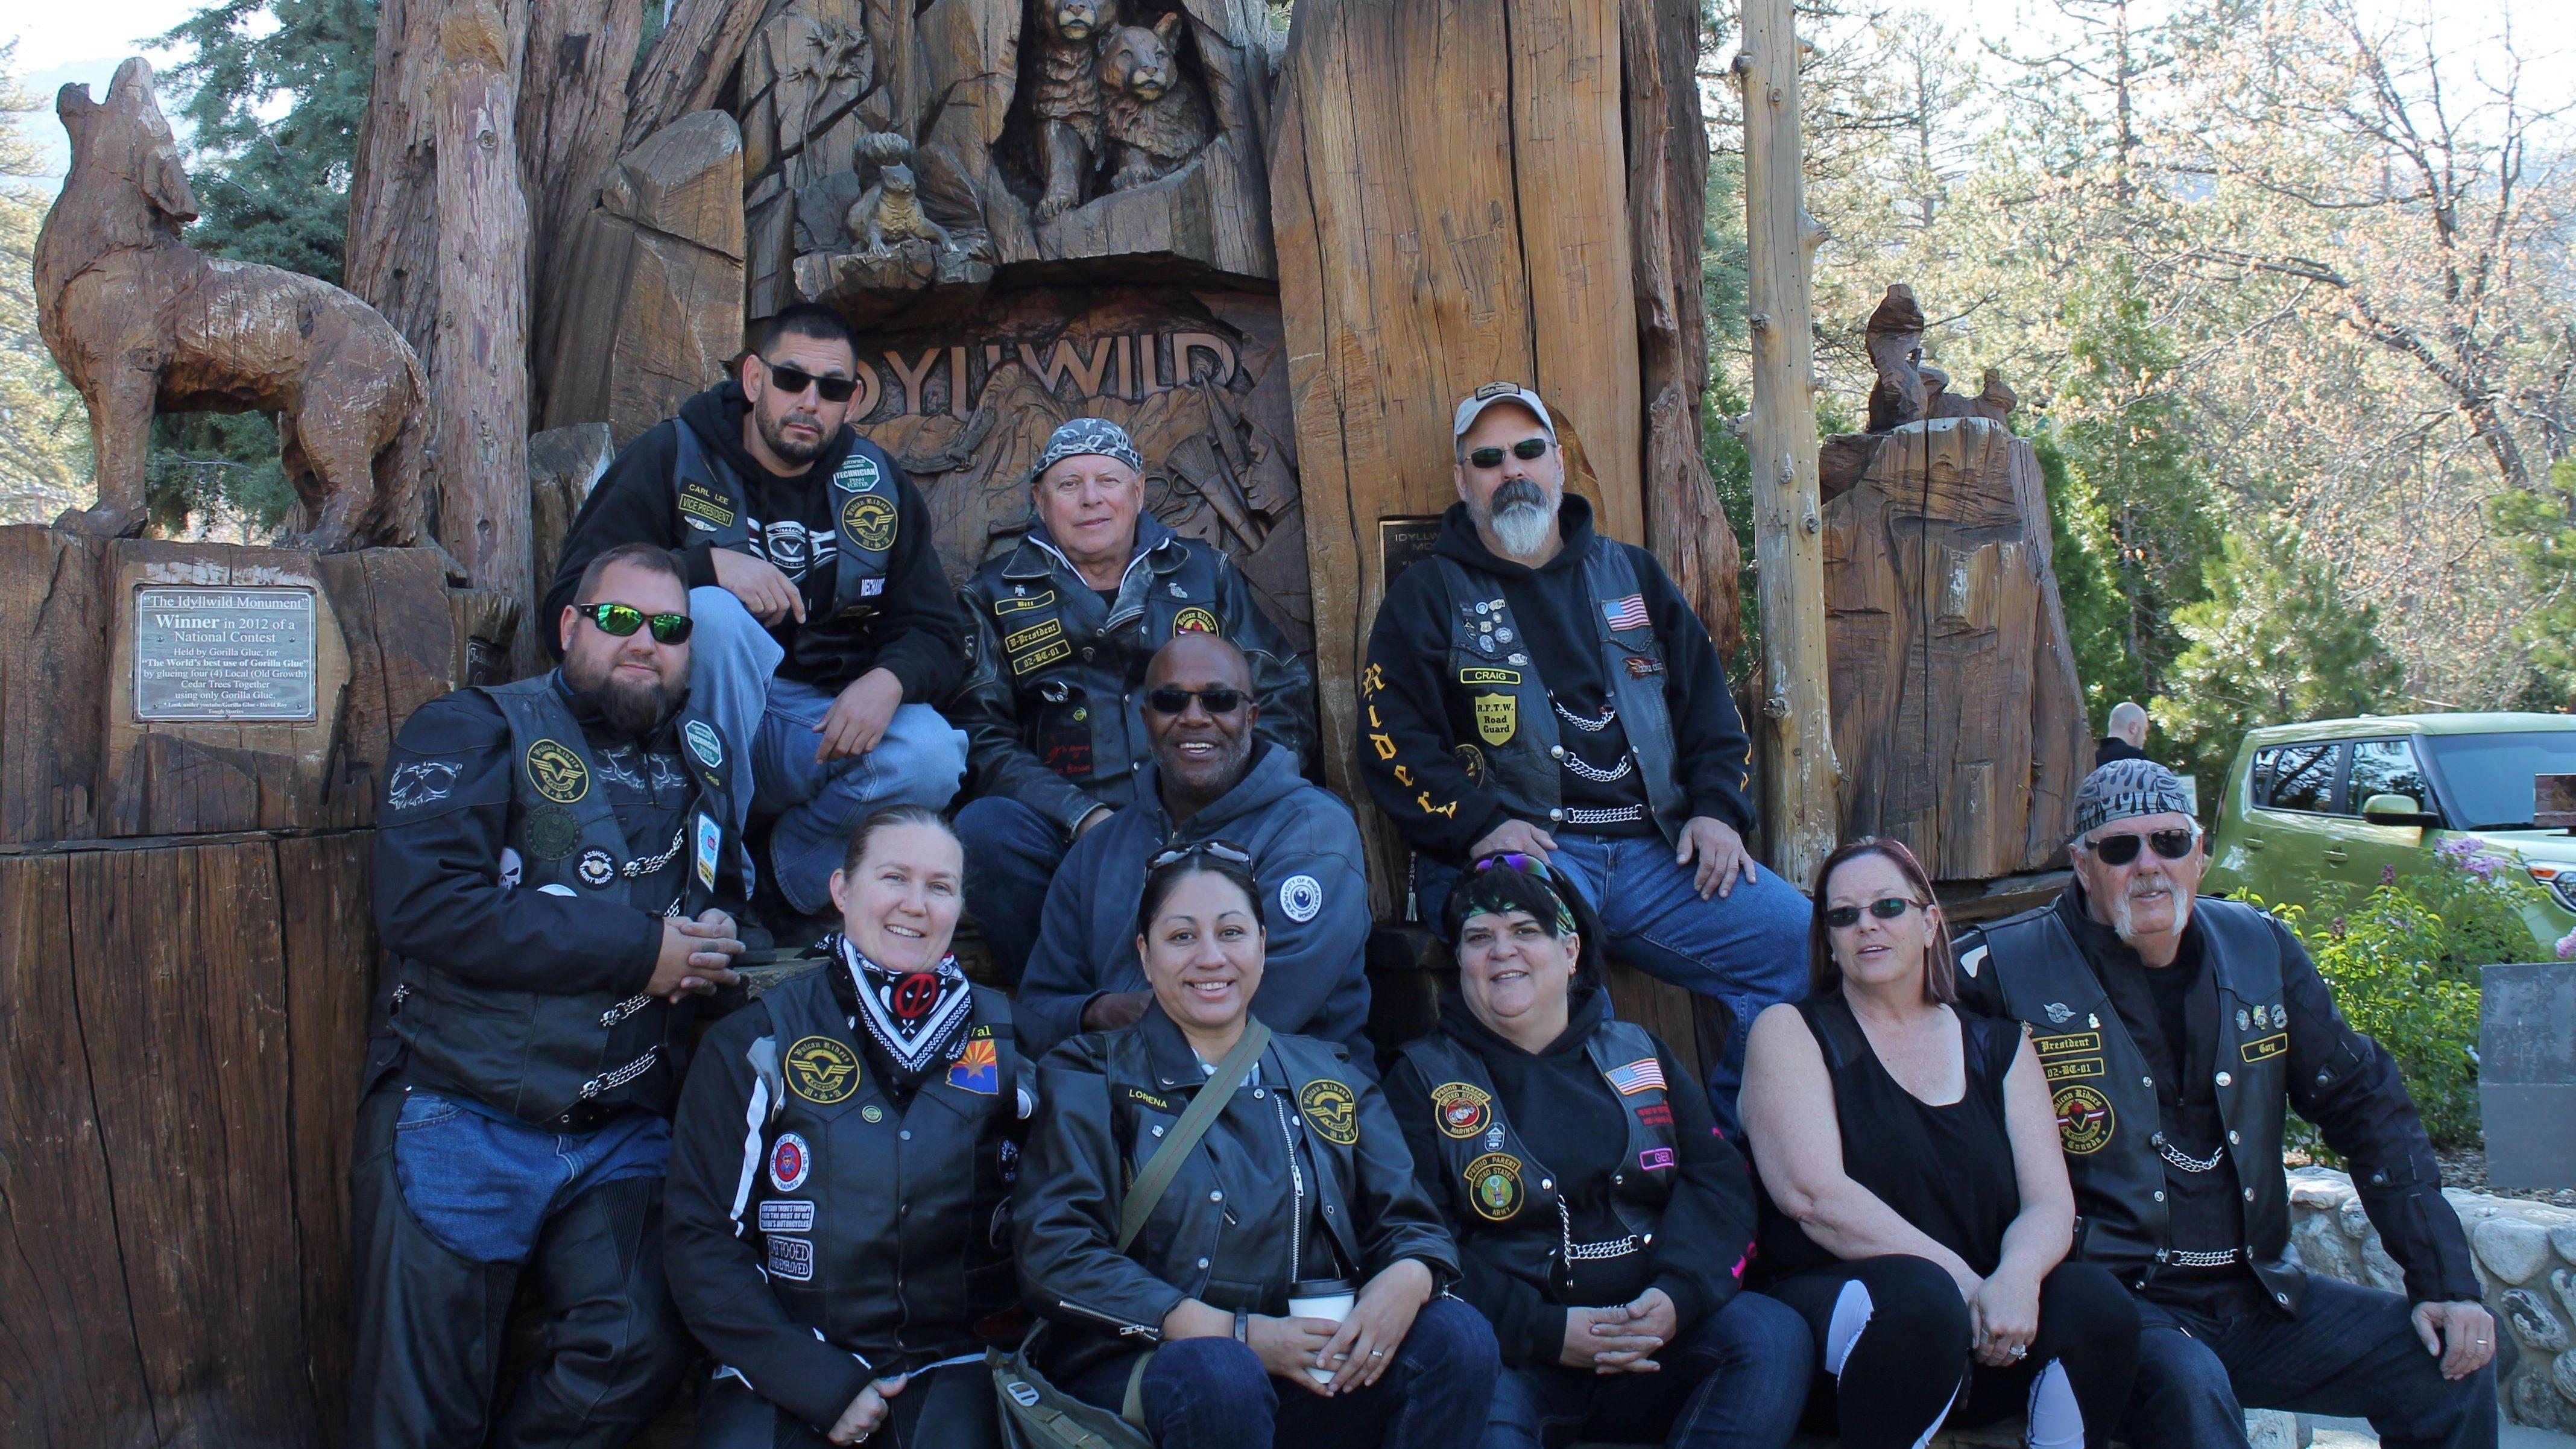 Phoenix Vulcan Riders